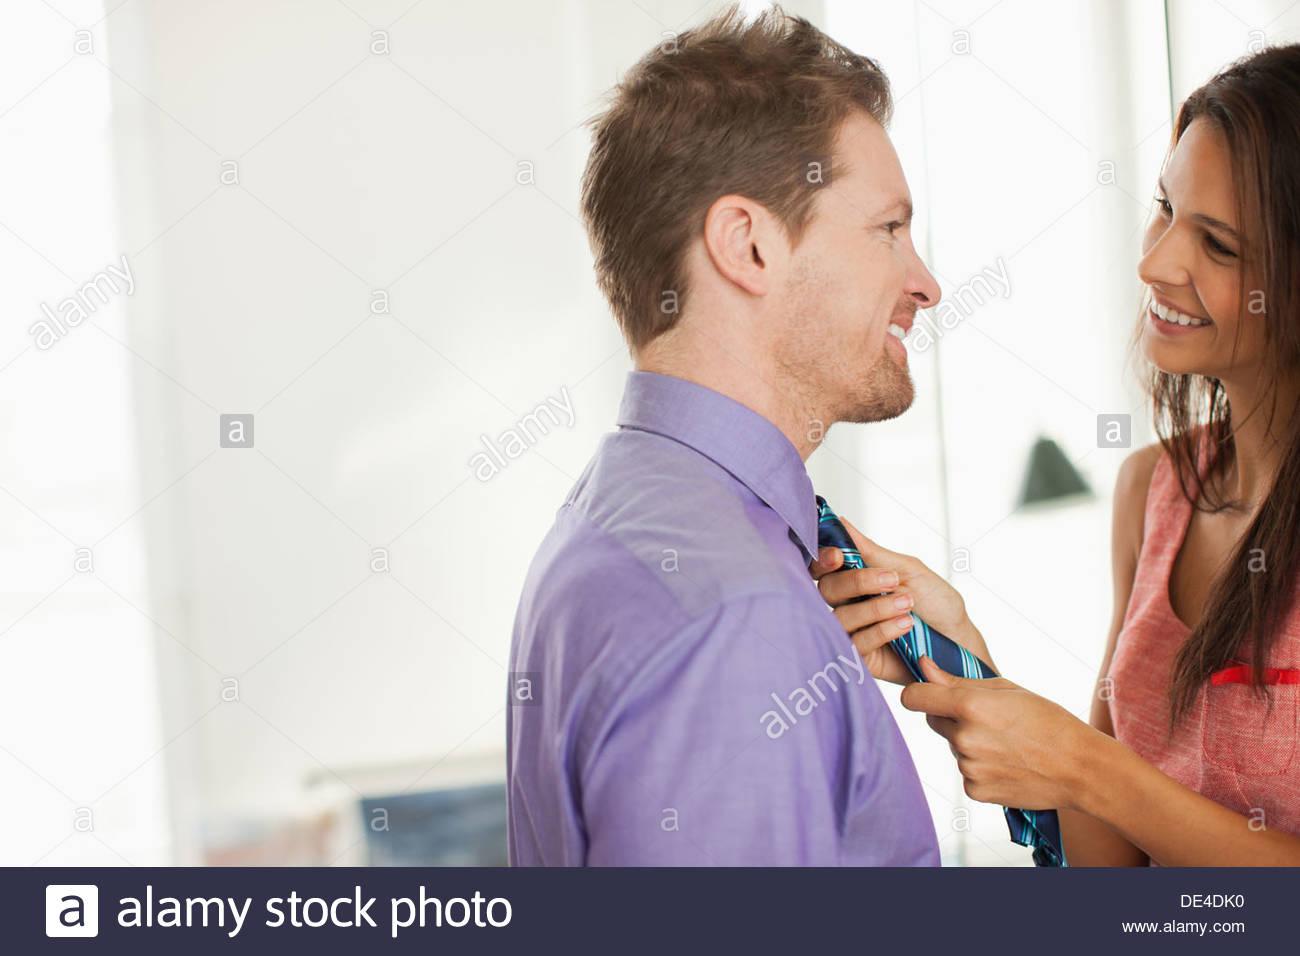 Woman tying husbandÂ's necktie for him - Stock Image